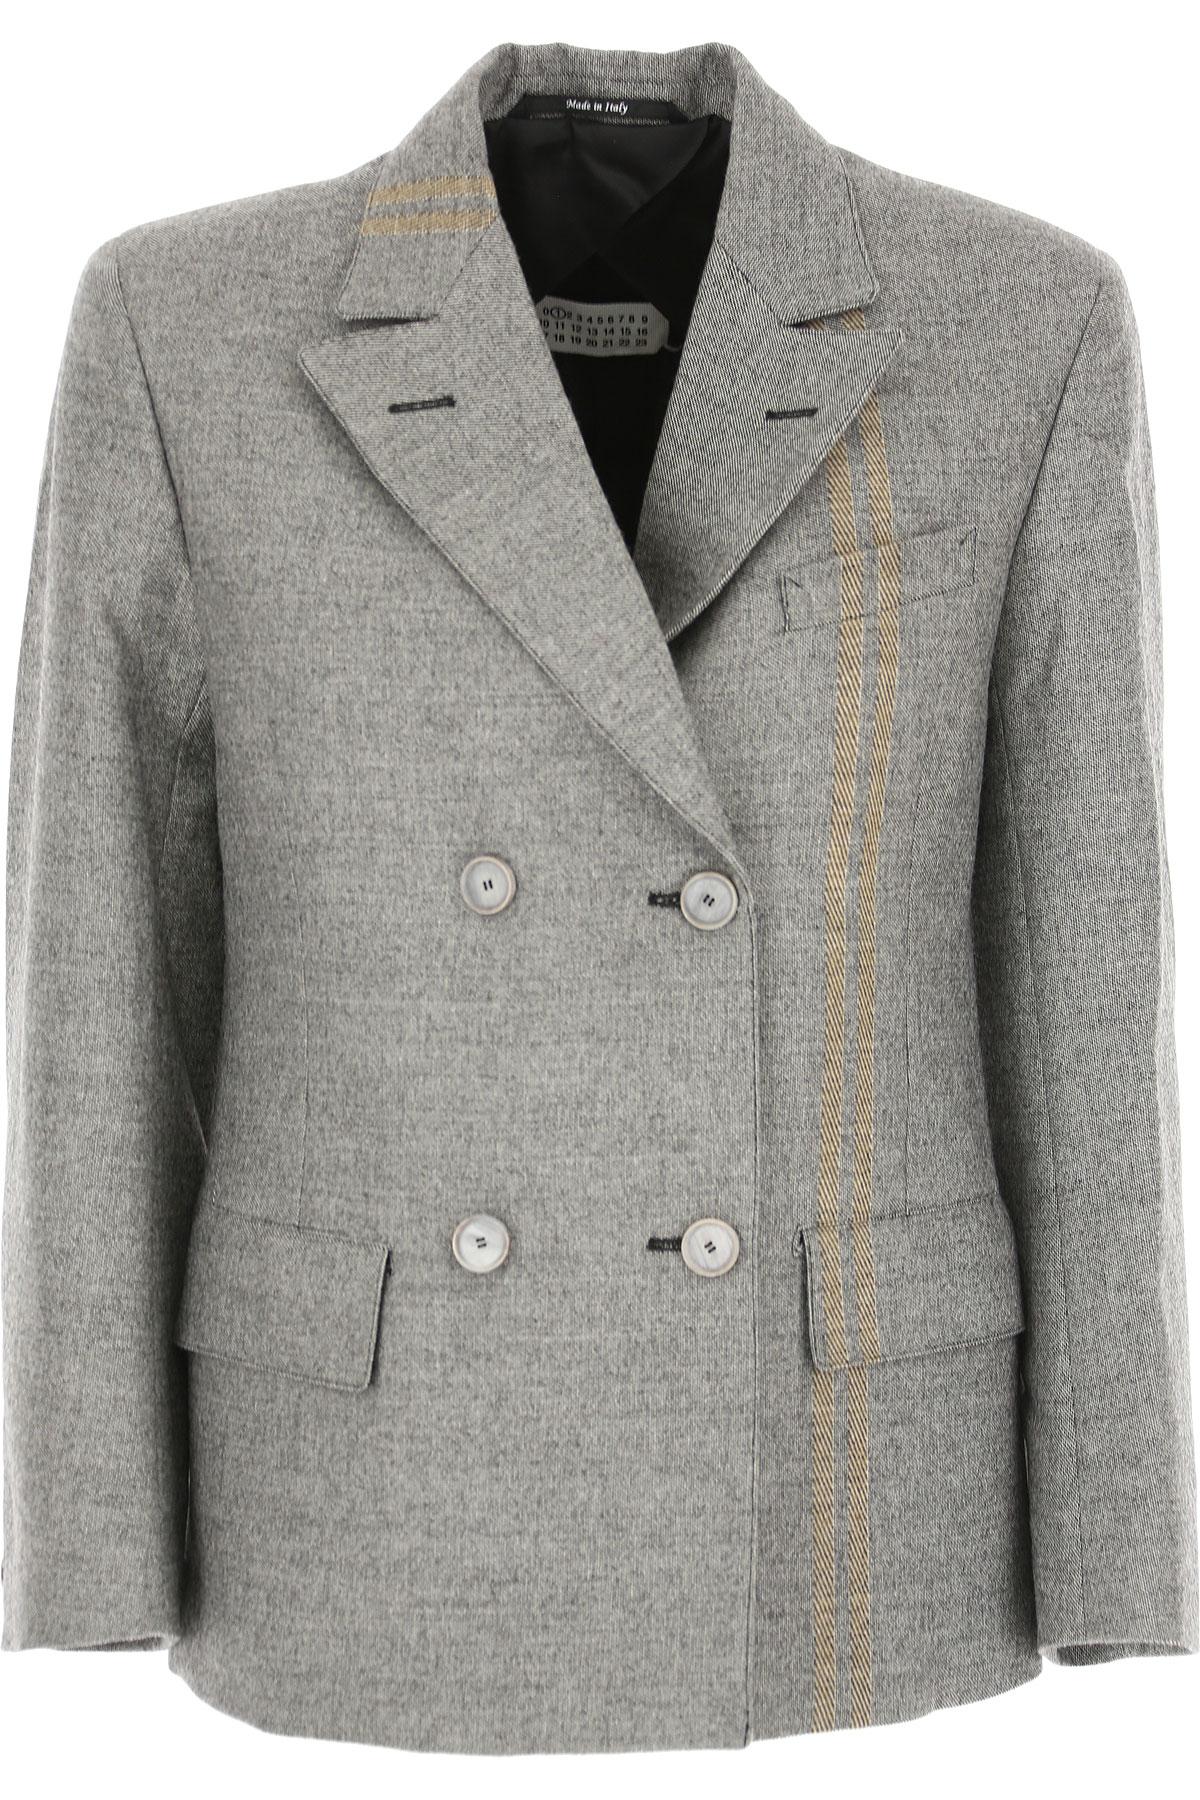 Image of Maison Martin Margiela Blazer for Women, Grey, Virgin wool, 2017, UK 10 - US 8 - EU 42 UK 12 - US 10 - EU 44